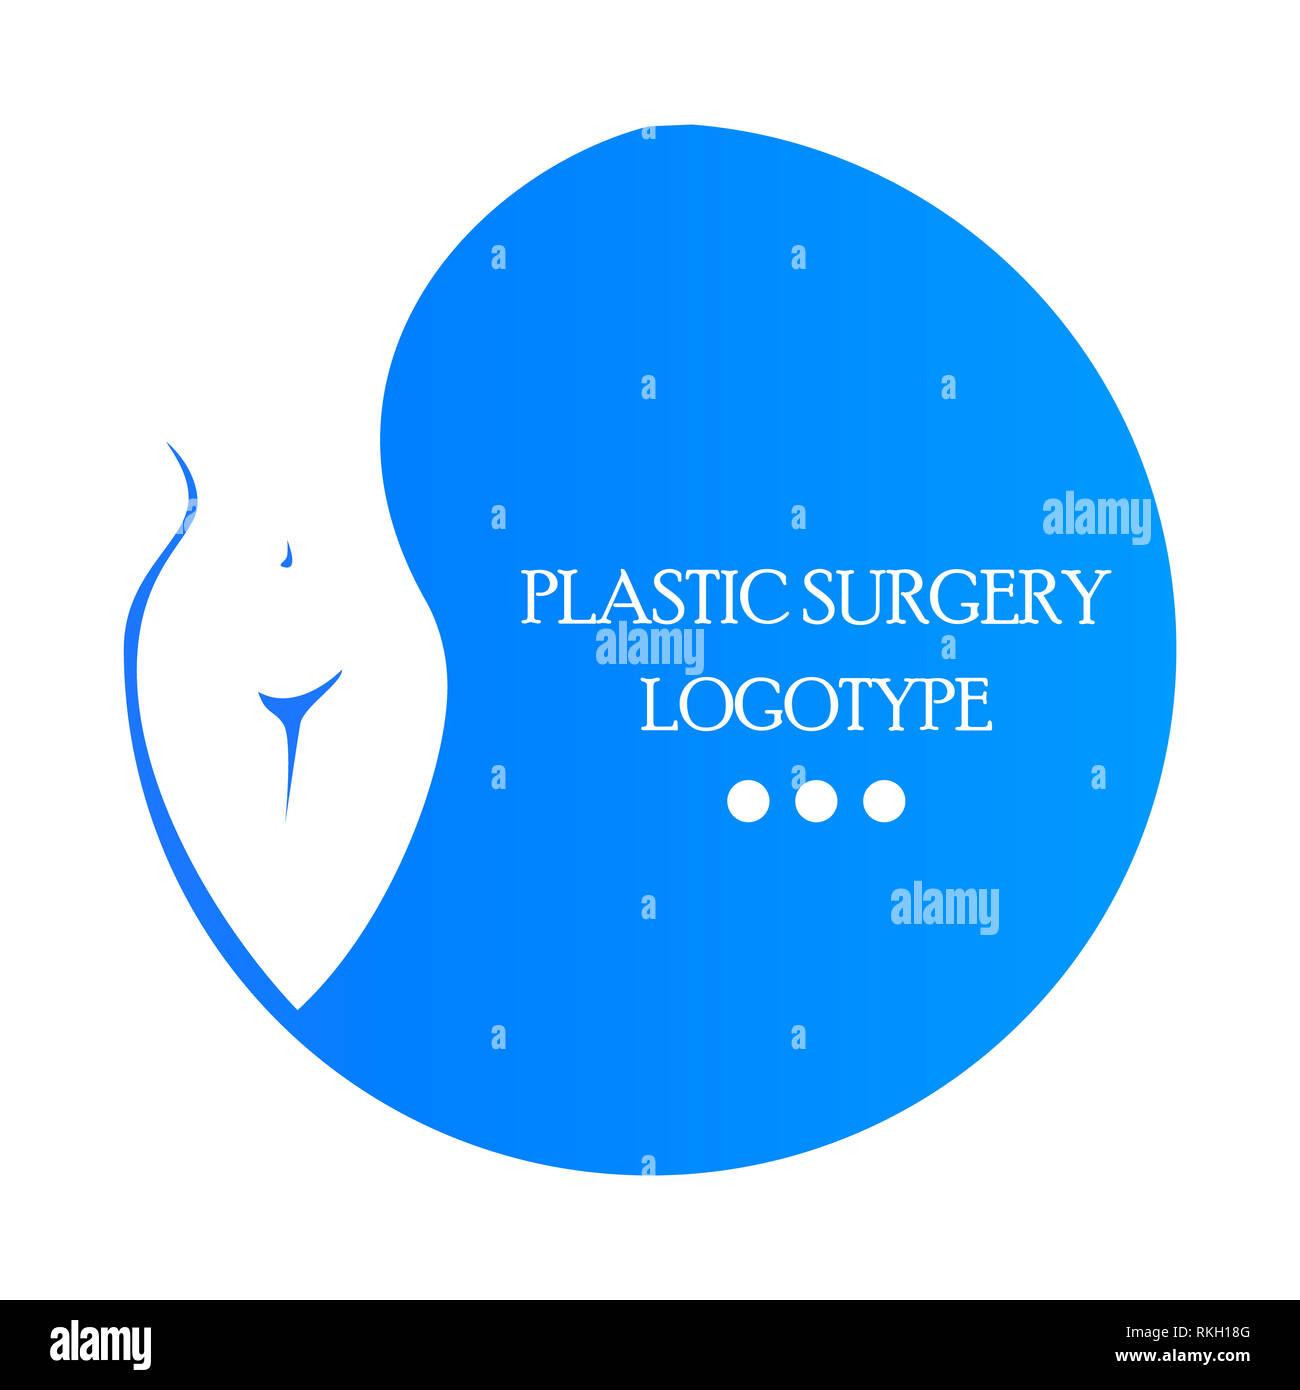 Plastic Surgery Clinic Logo Medical Beauty Logotype Emblem With Female Body Body Correction Surgeon Stock Photo Alamy